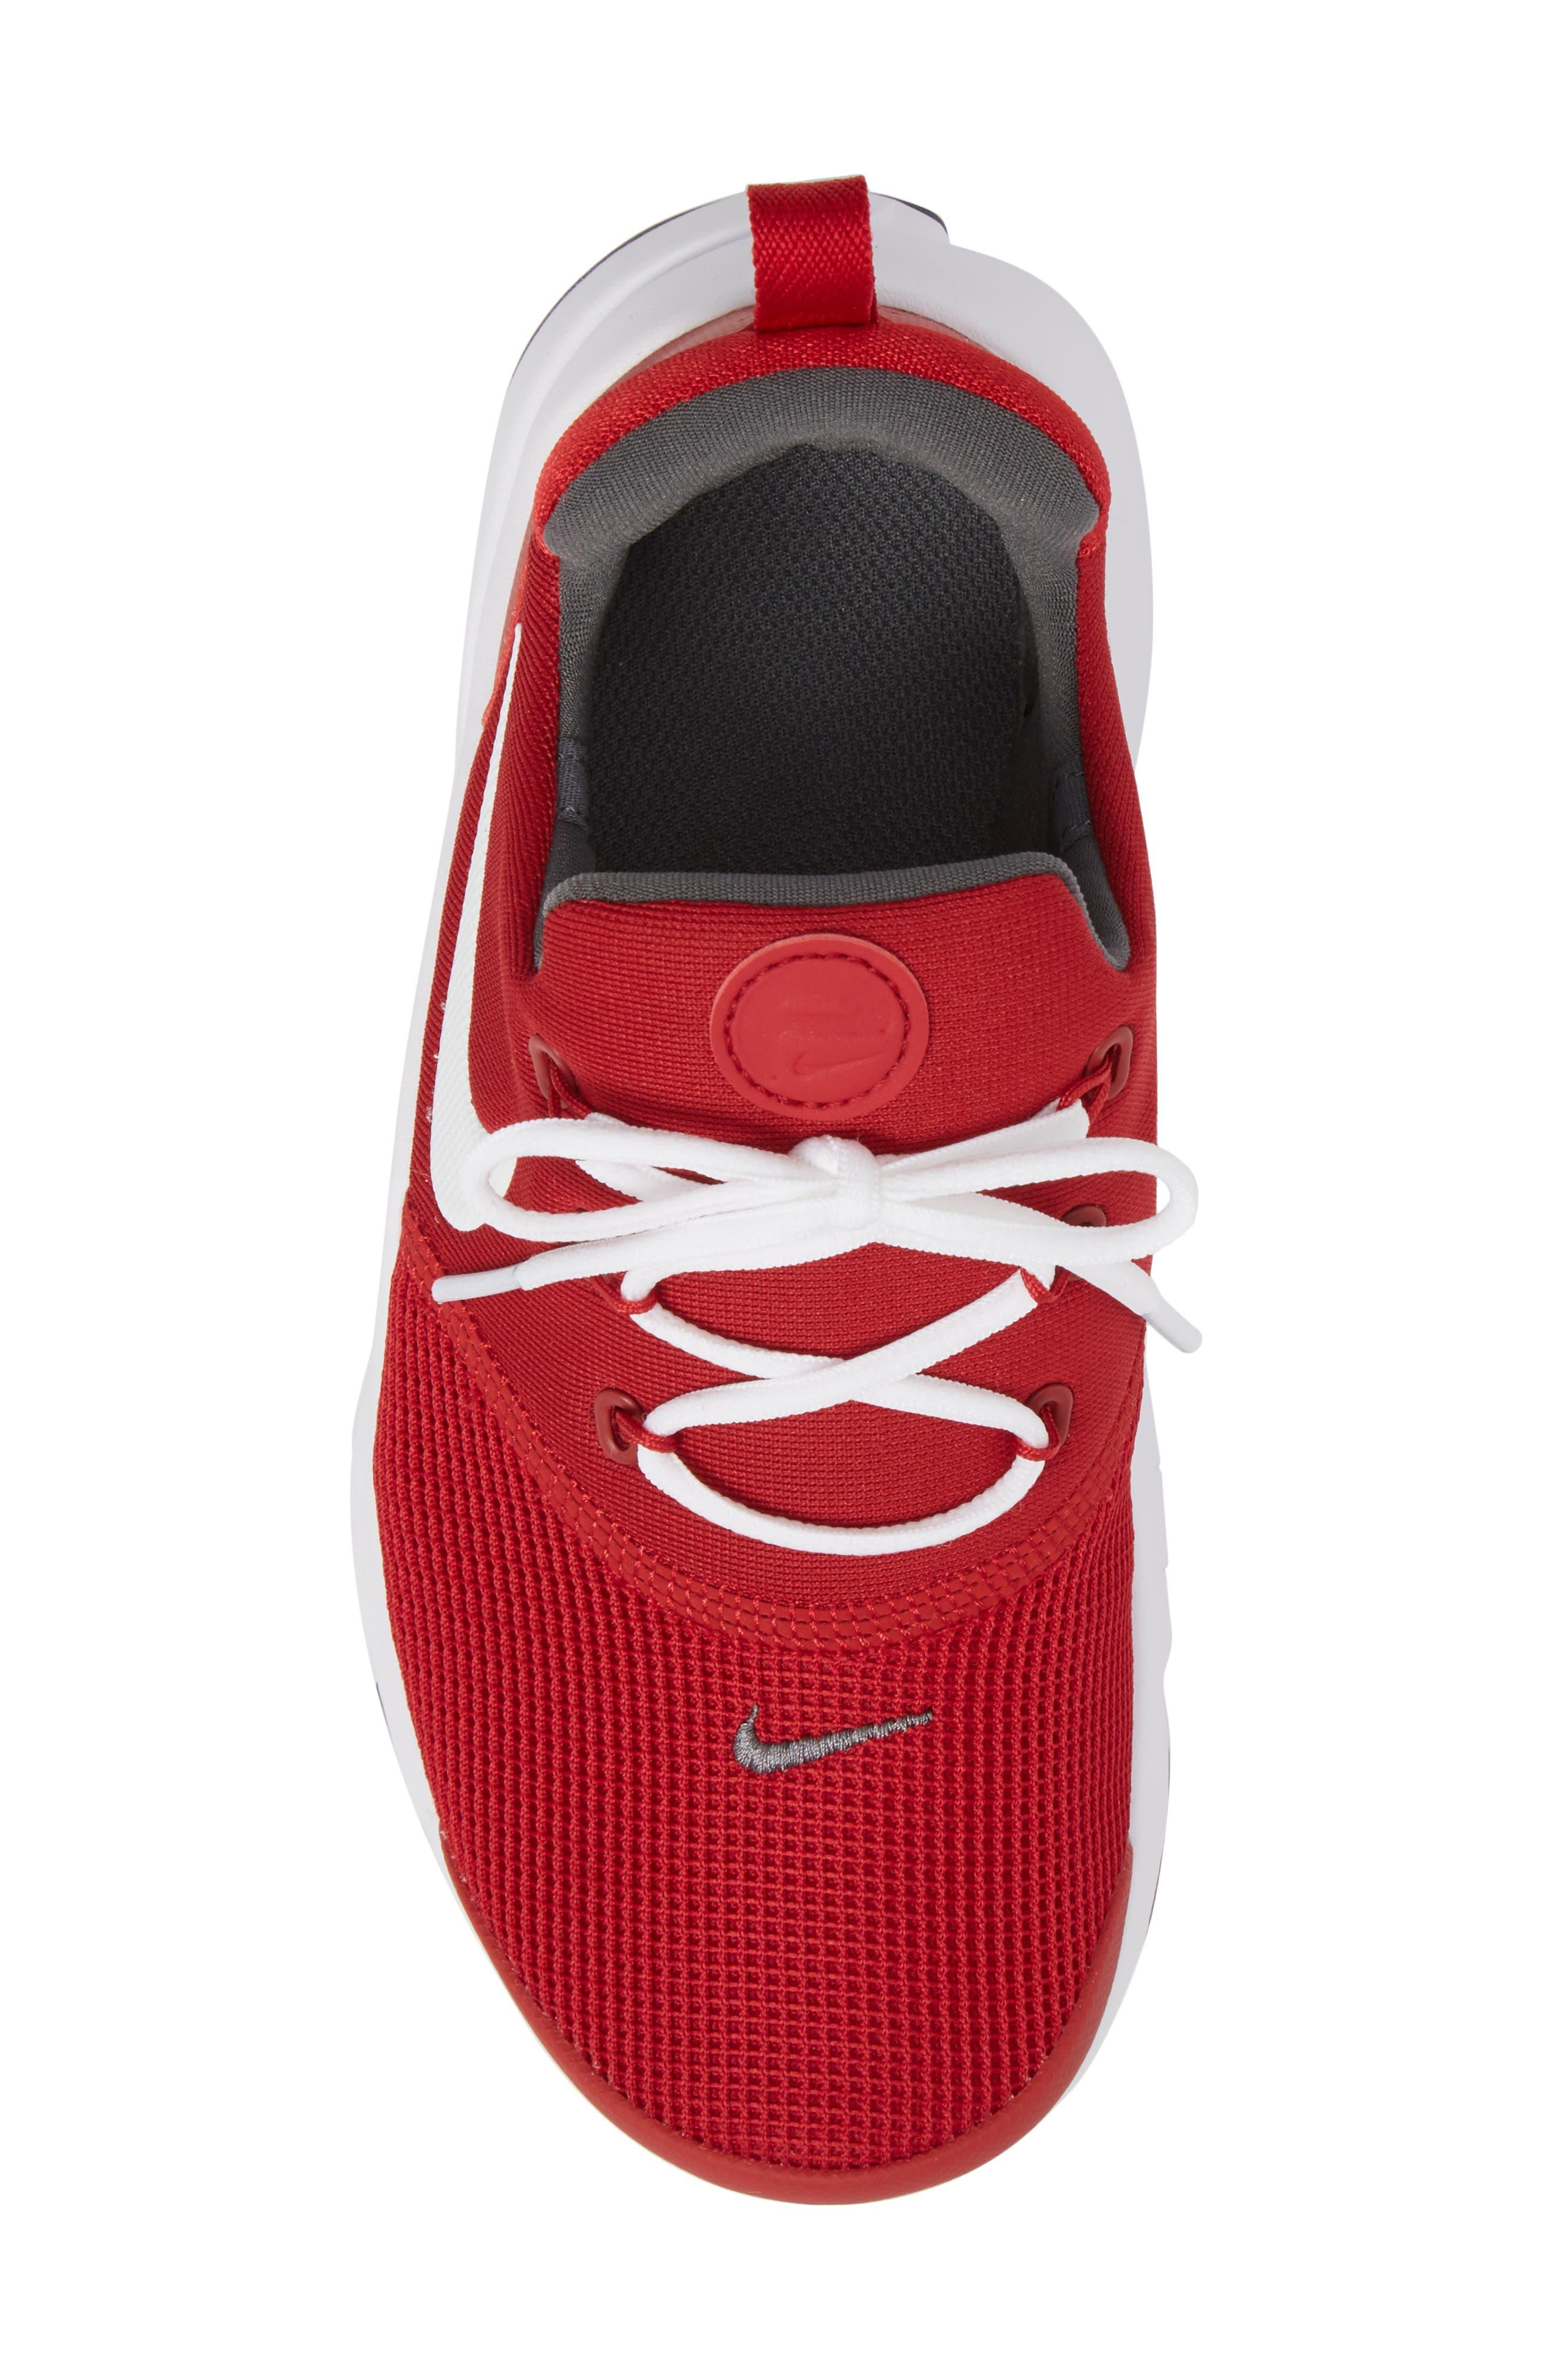 Presto Fly Sneaker,                             Alternate thumbnail 5, color,                             Gym Red/ Dark Grey/ White